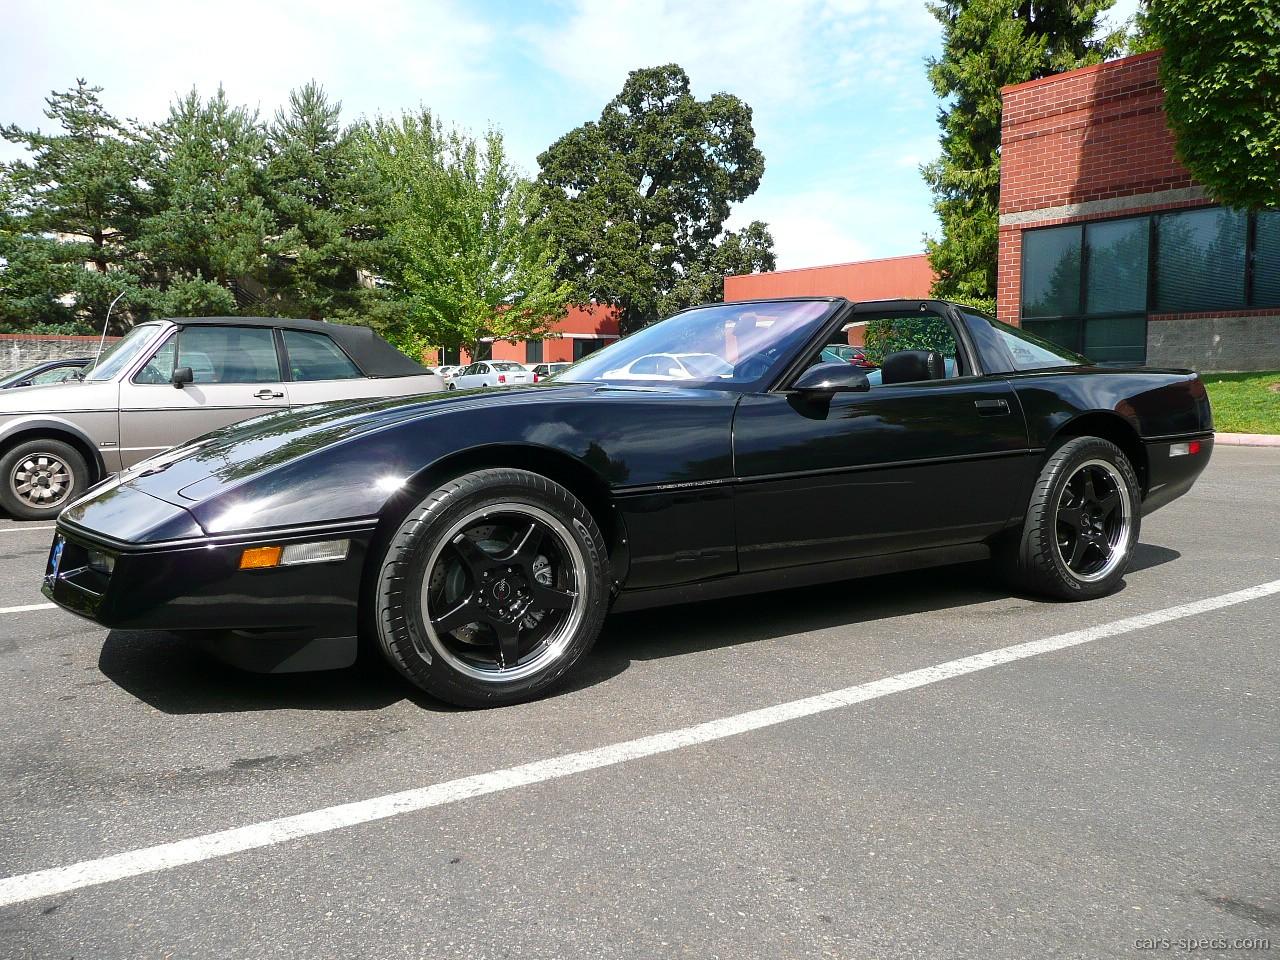 1992 Chevrolet Corvette ZR1 Specifications, Pictures, Prices